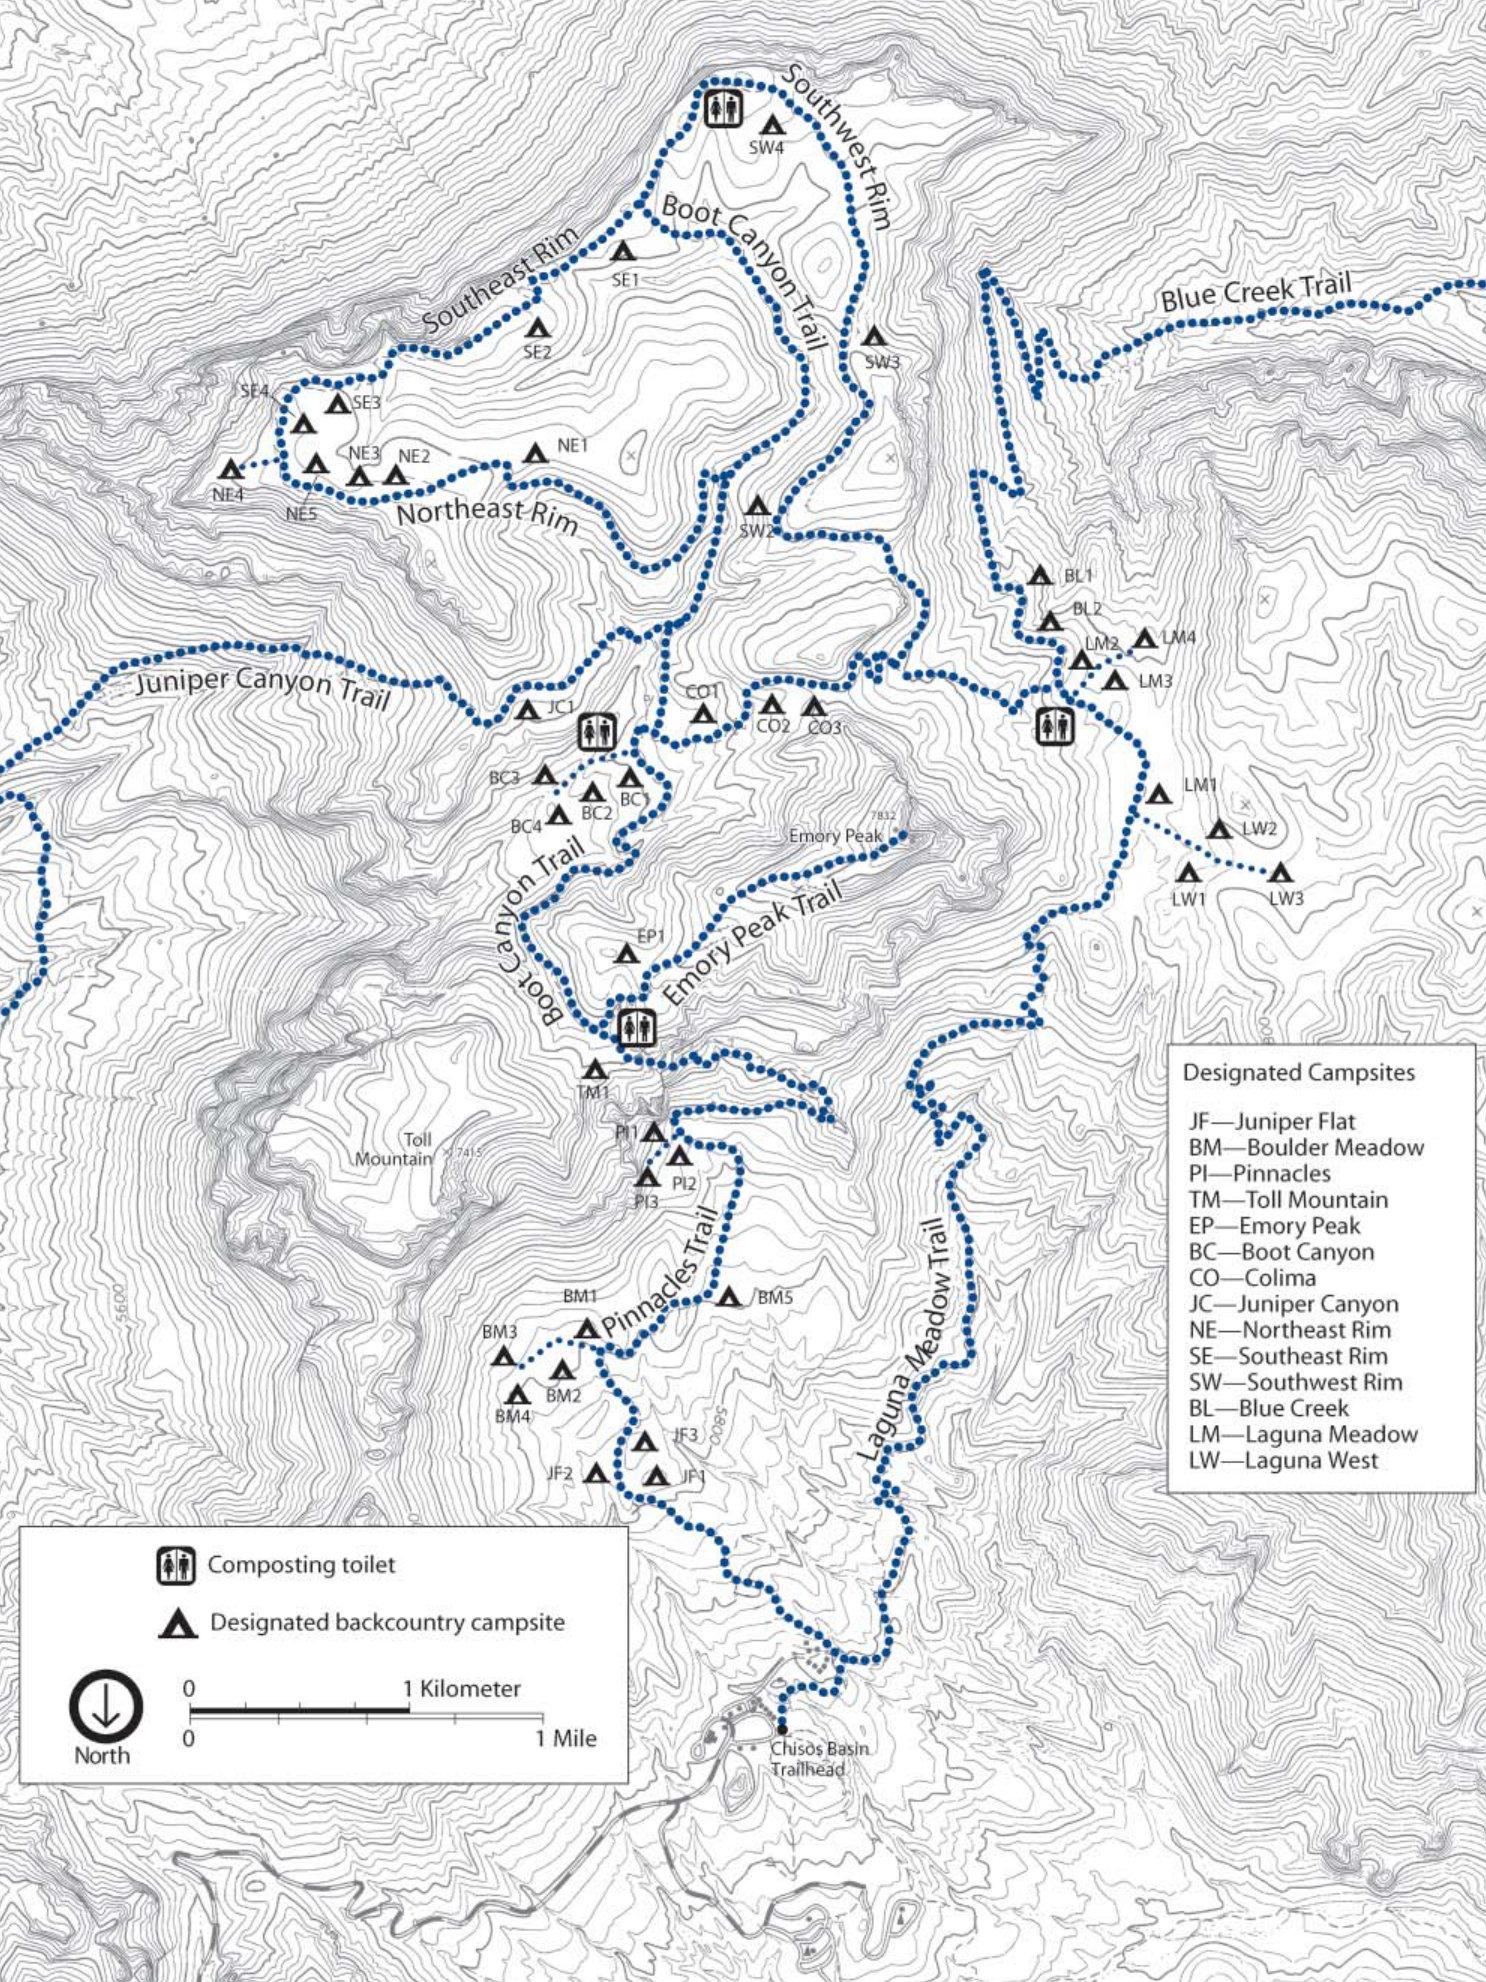 Big Bend Maps   Npmaps - Just Free Maps, Period. - Map Of Big Bend Area Texas